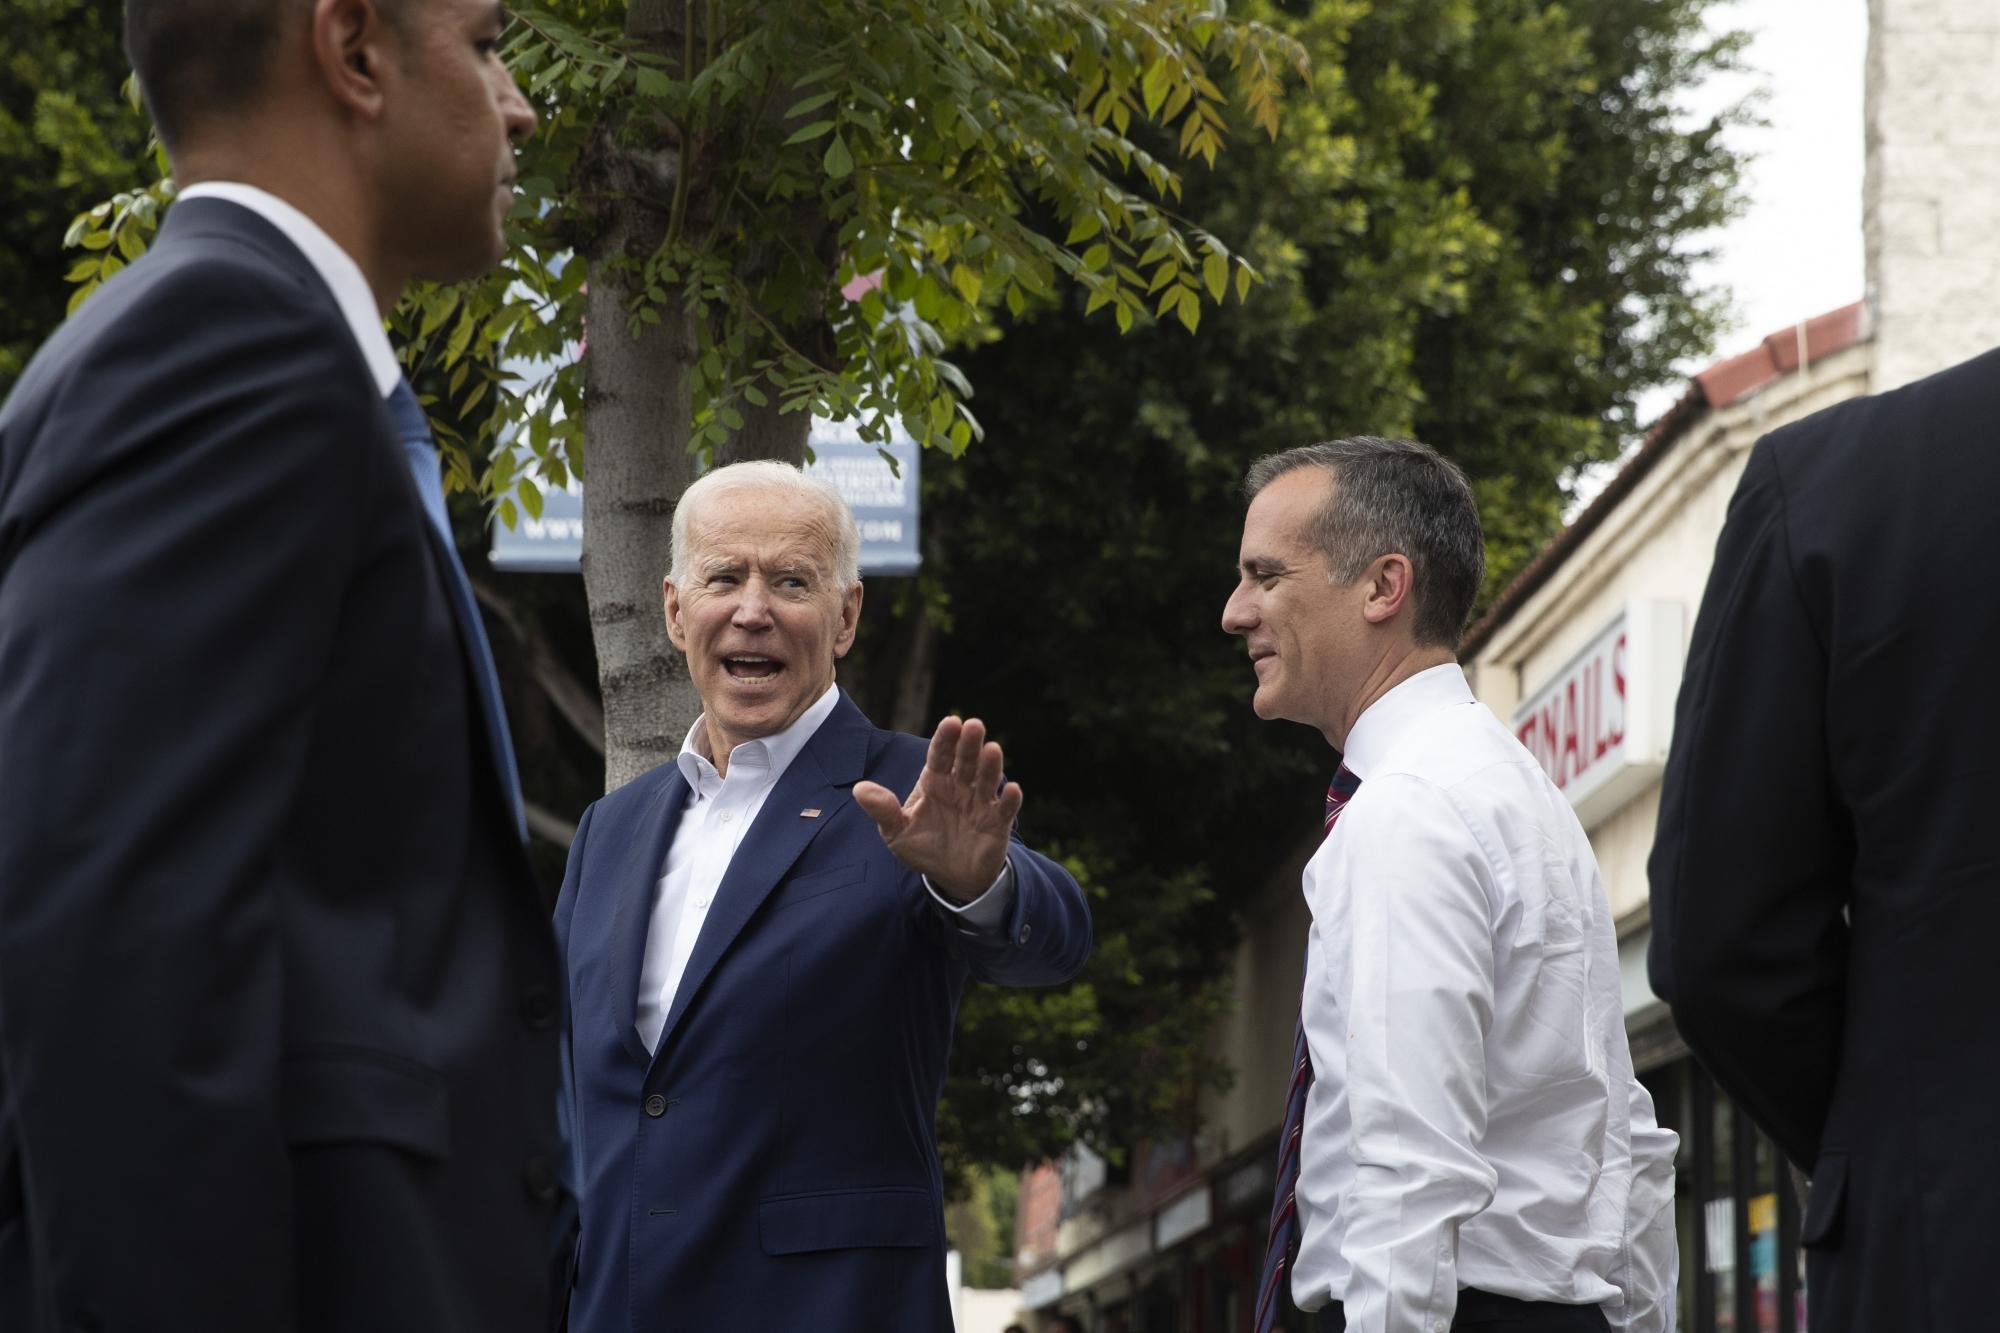 AP Source: Biden Rakes In $750,000 At Hollywood Fundraiser